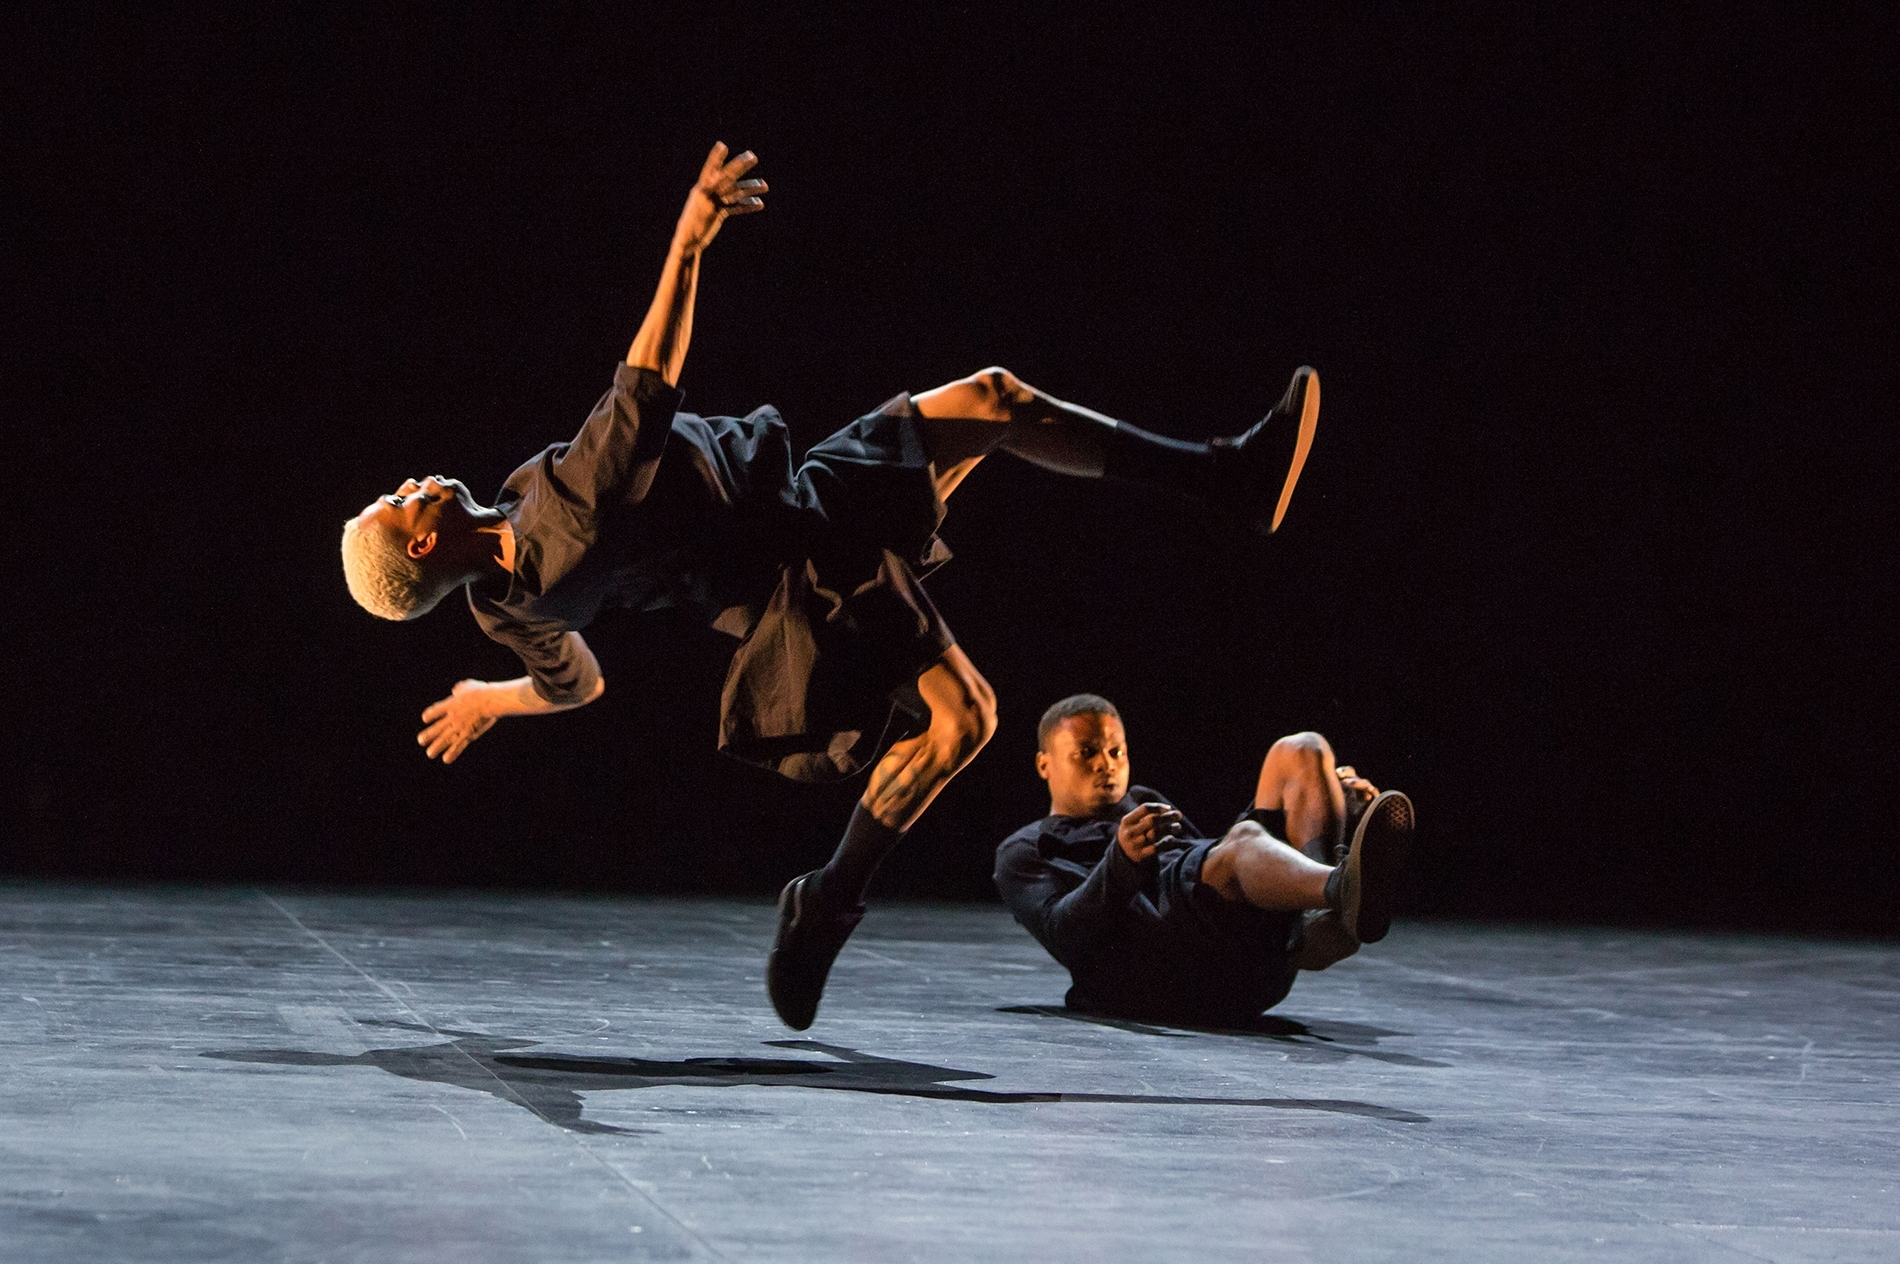 spectacle danse Inoah de BrunoBeltrão